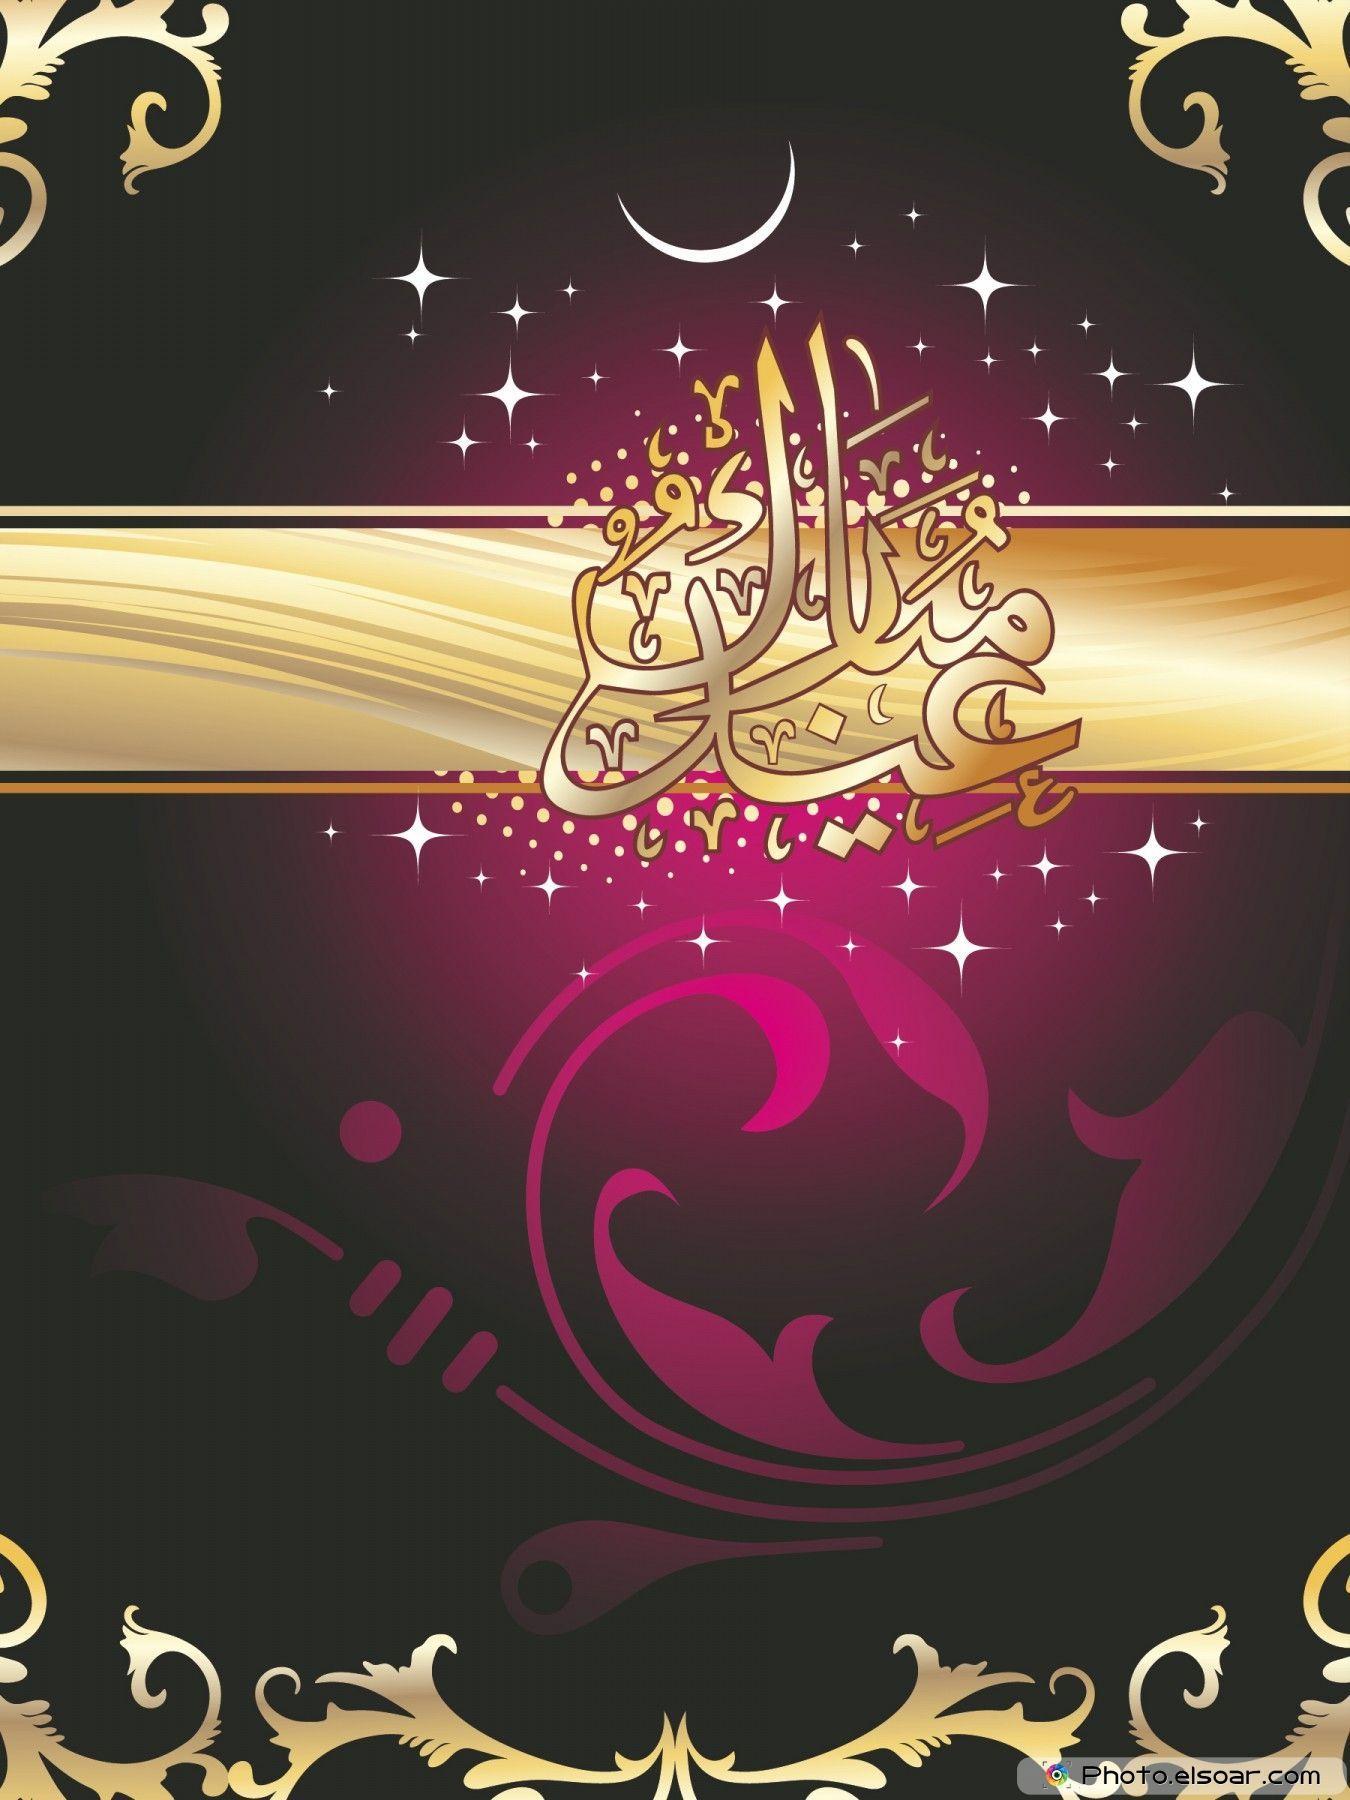 Eid mubarak hd wallpapers wallpaper cave 10 most beautiful free eid mubarak hd wallpapers elsoar m4hsunfo